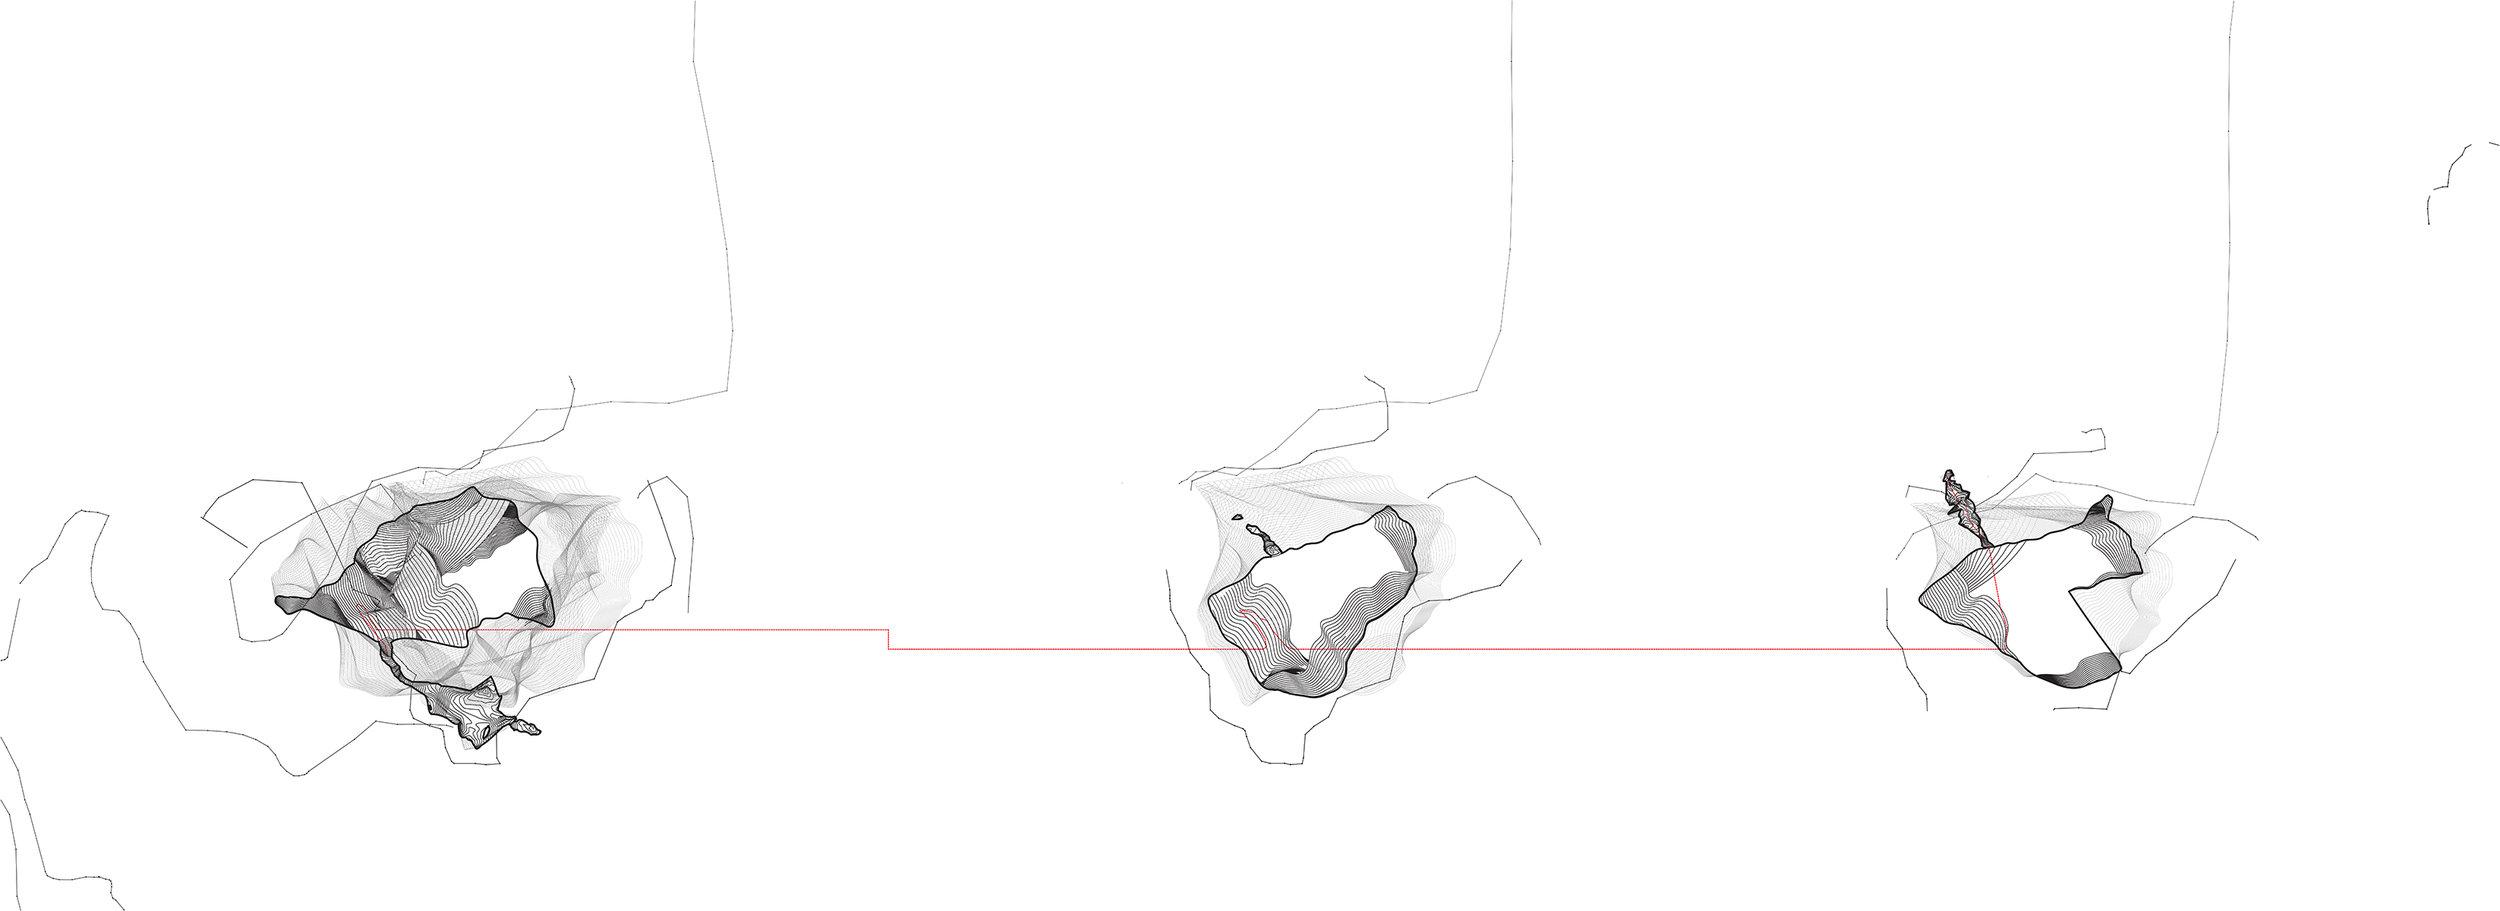 final plans(5-24) sm.jpg